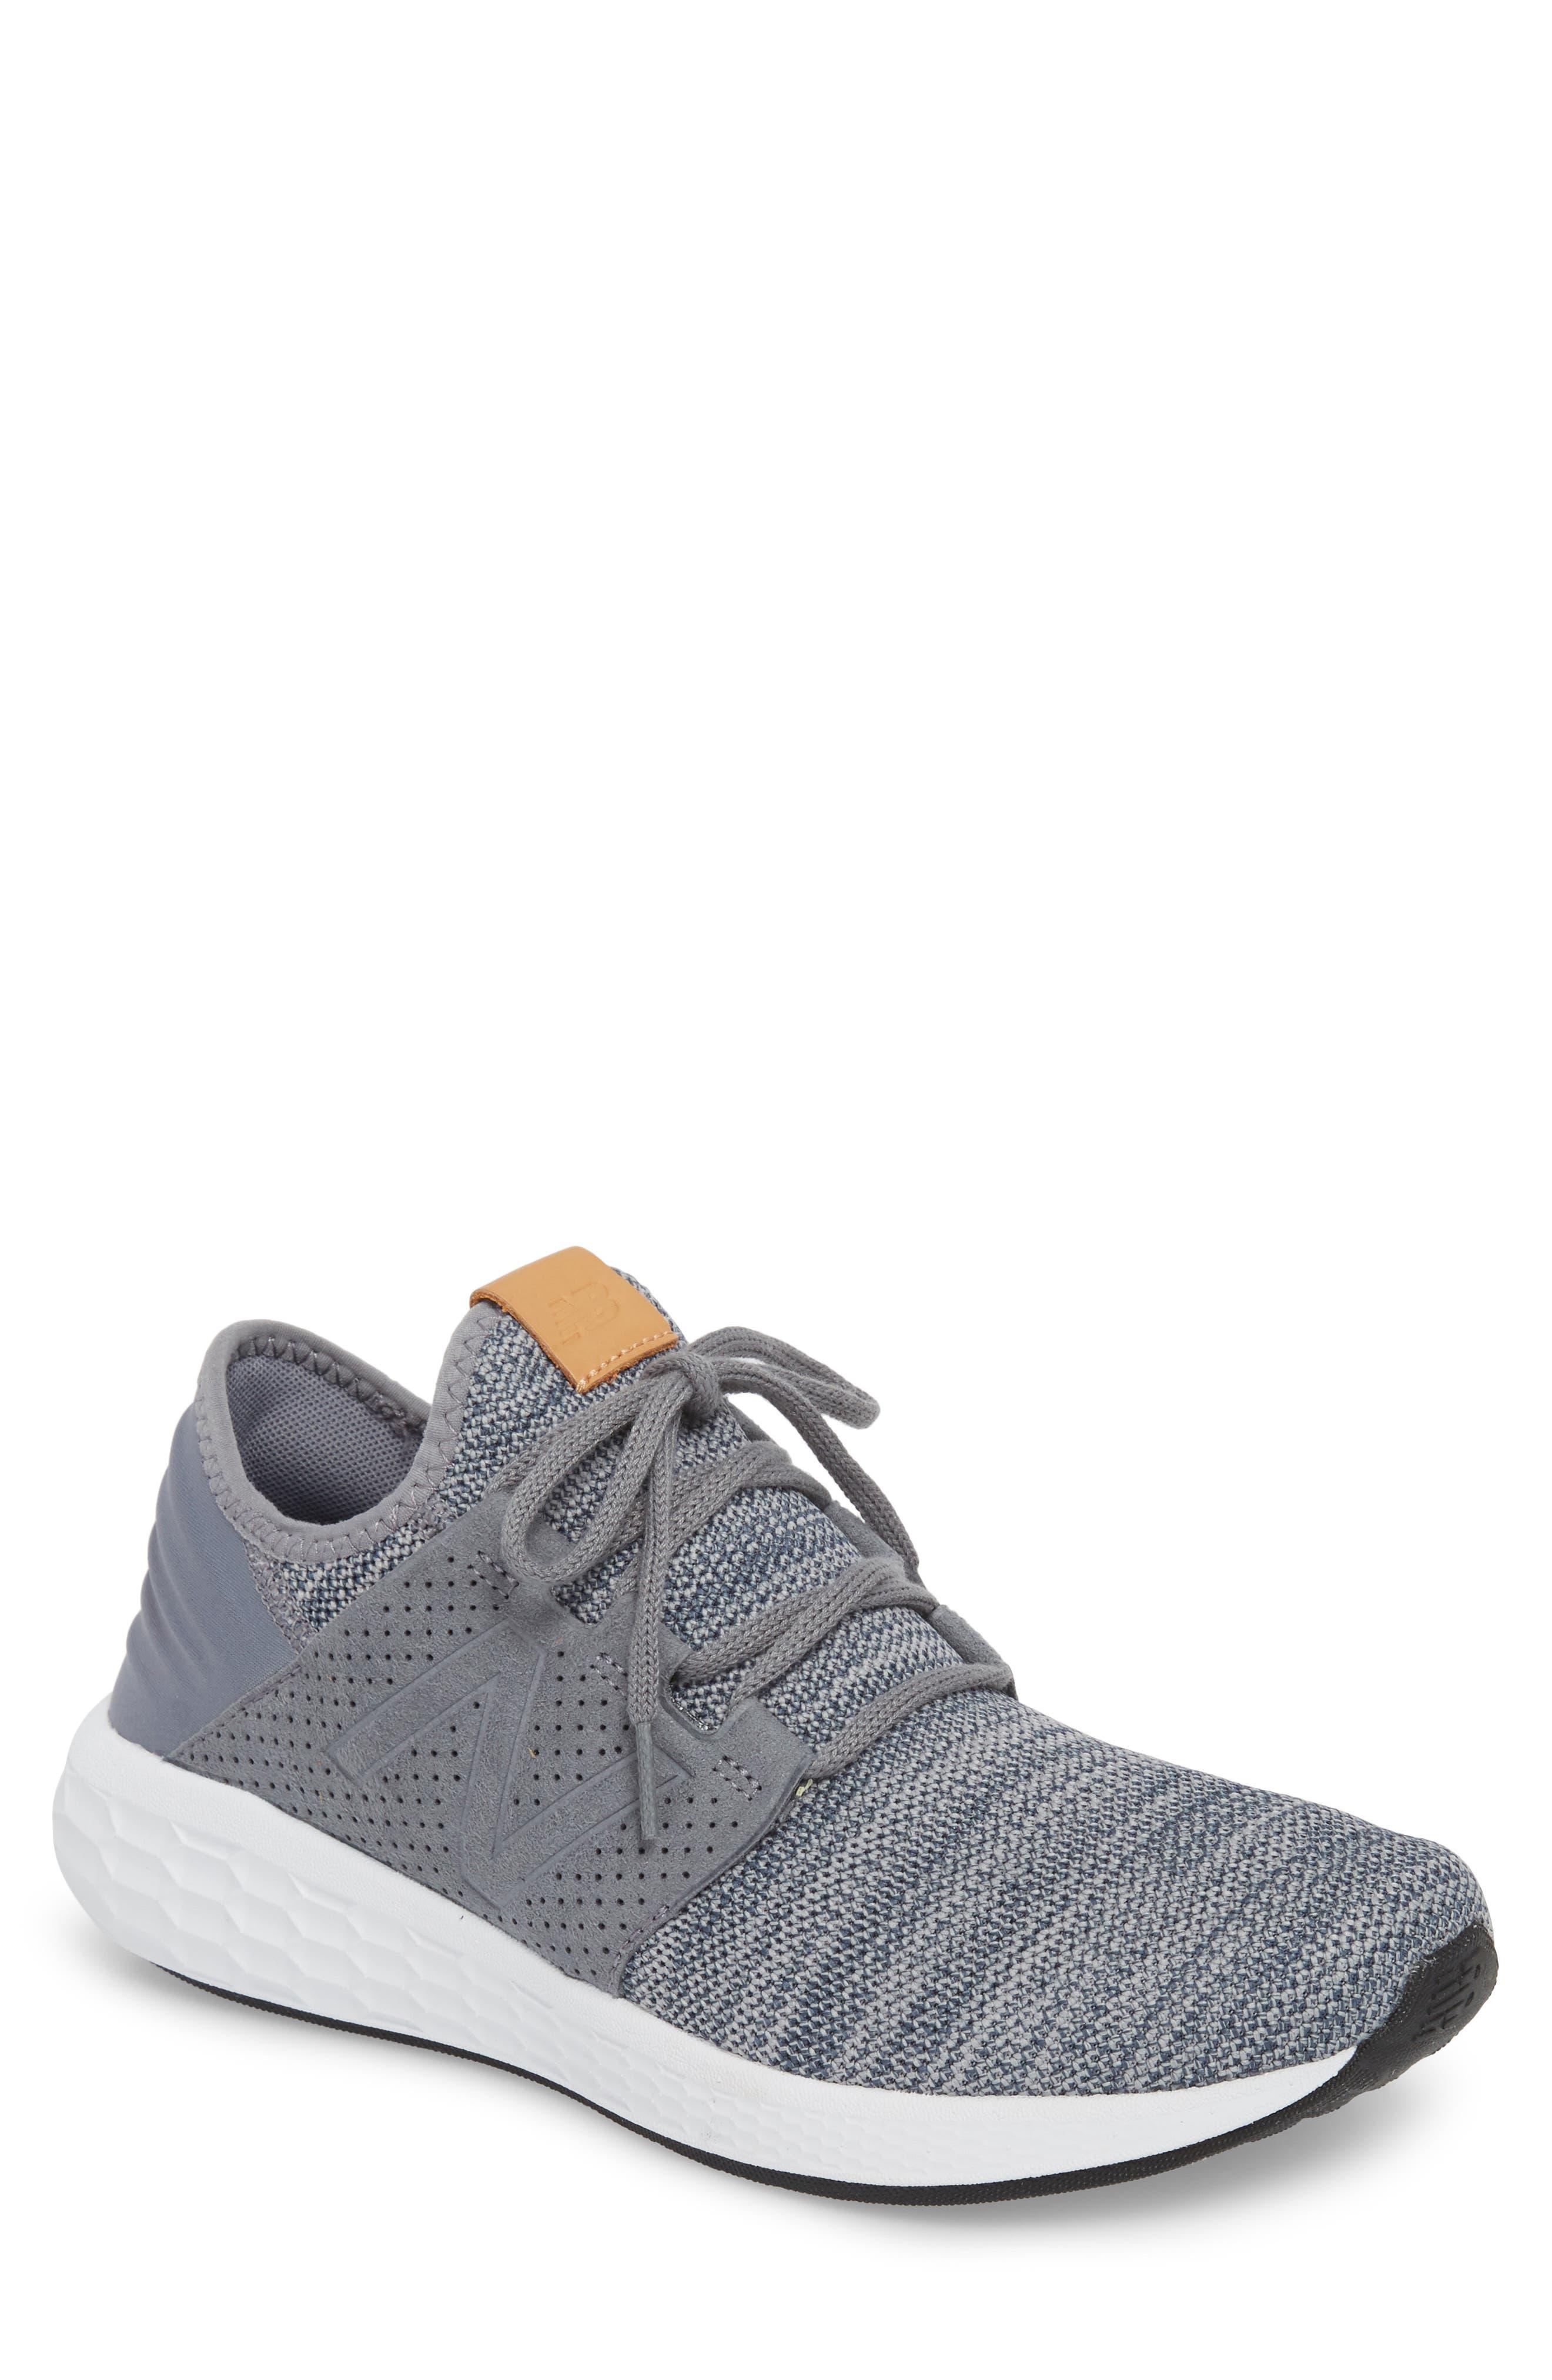 Fresh Foam Cruz v2 Knit Running Shoe,                             Main thumbnail 1, color,                             GUNMETAL